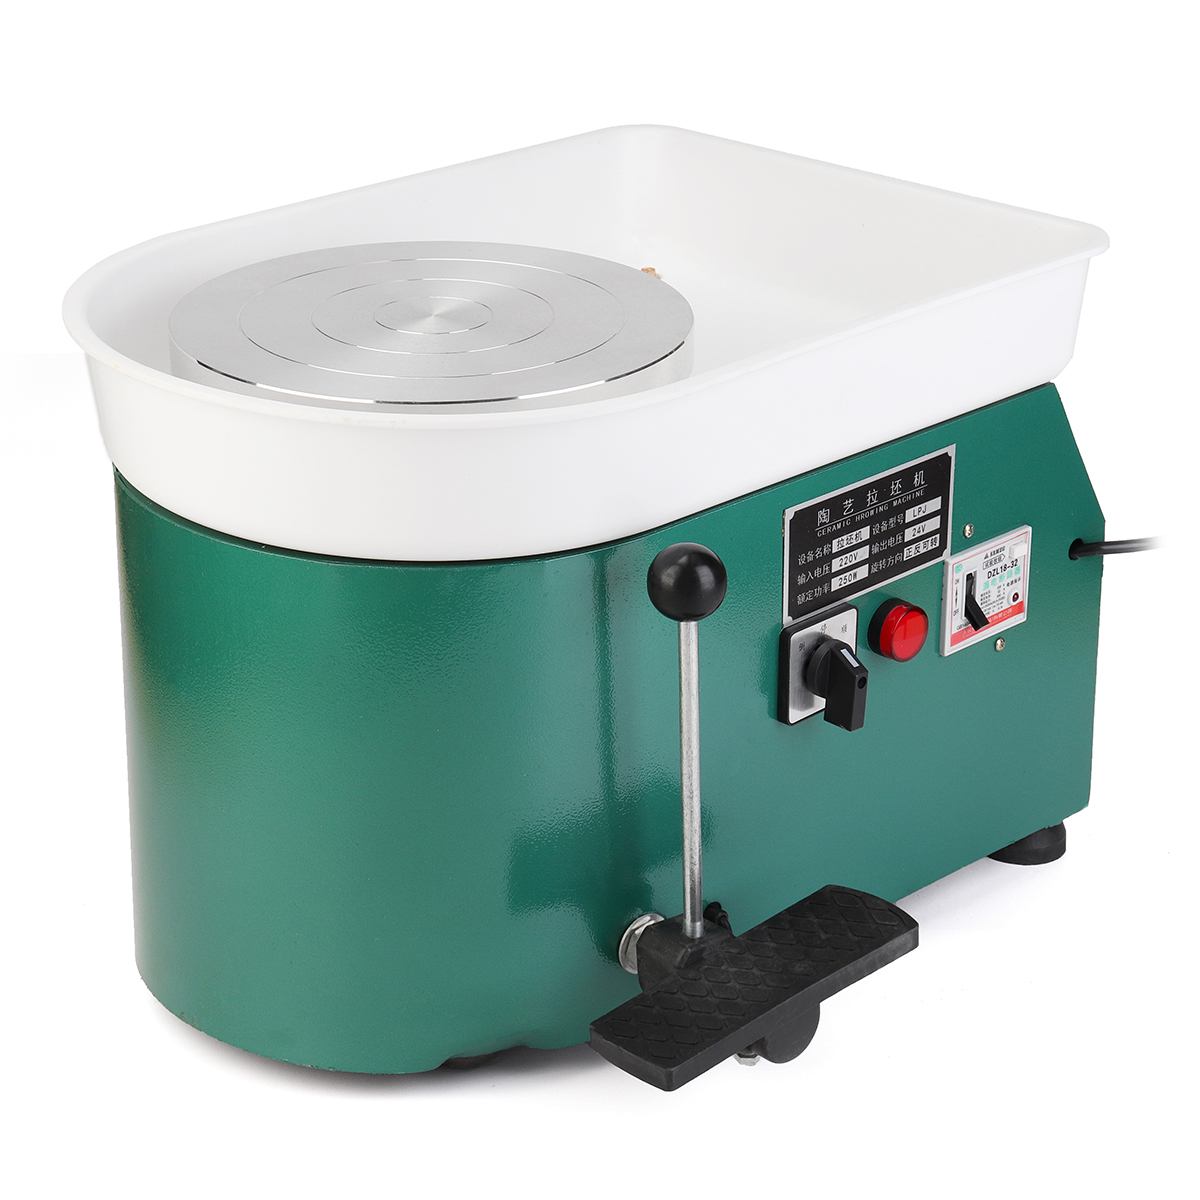 220V 250W 1 Set Green Color AU Plug Electric Pottery Wheel Ceramic Machine DIY Clay Art Craft Tool Equipment